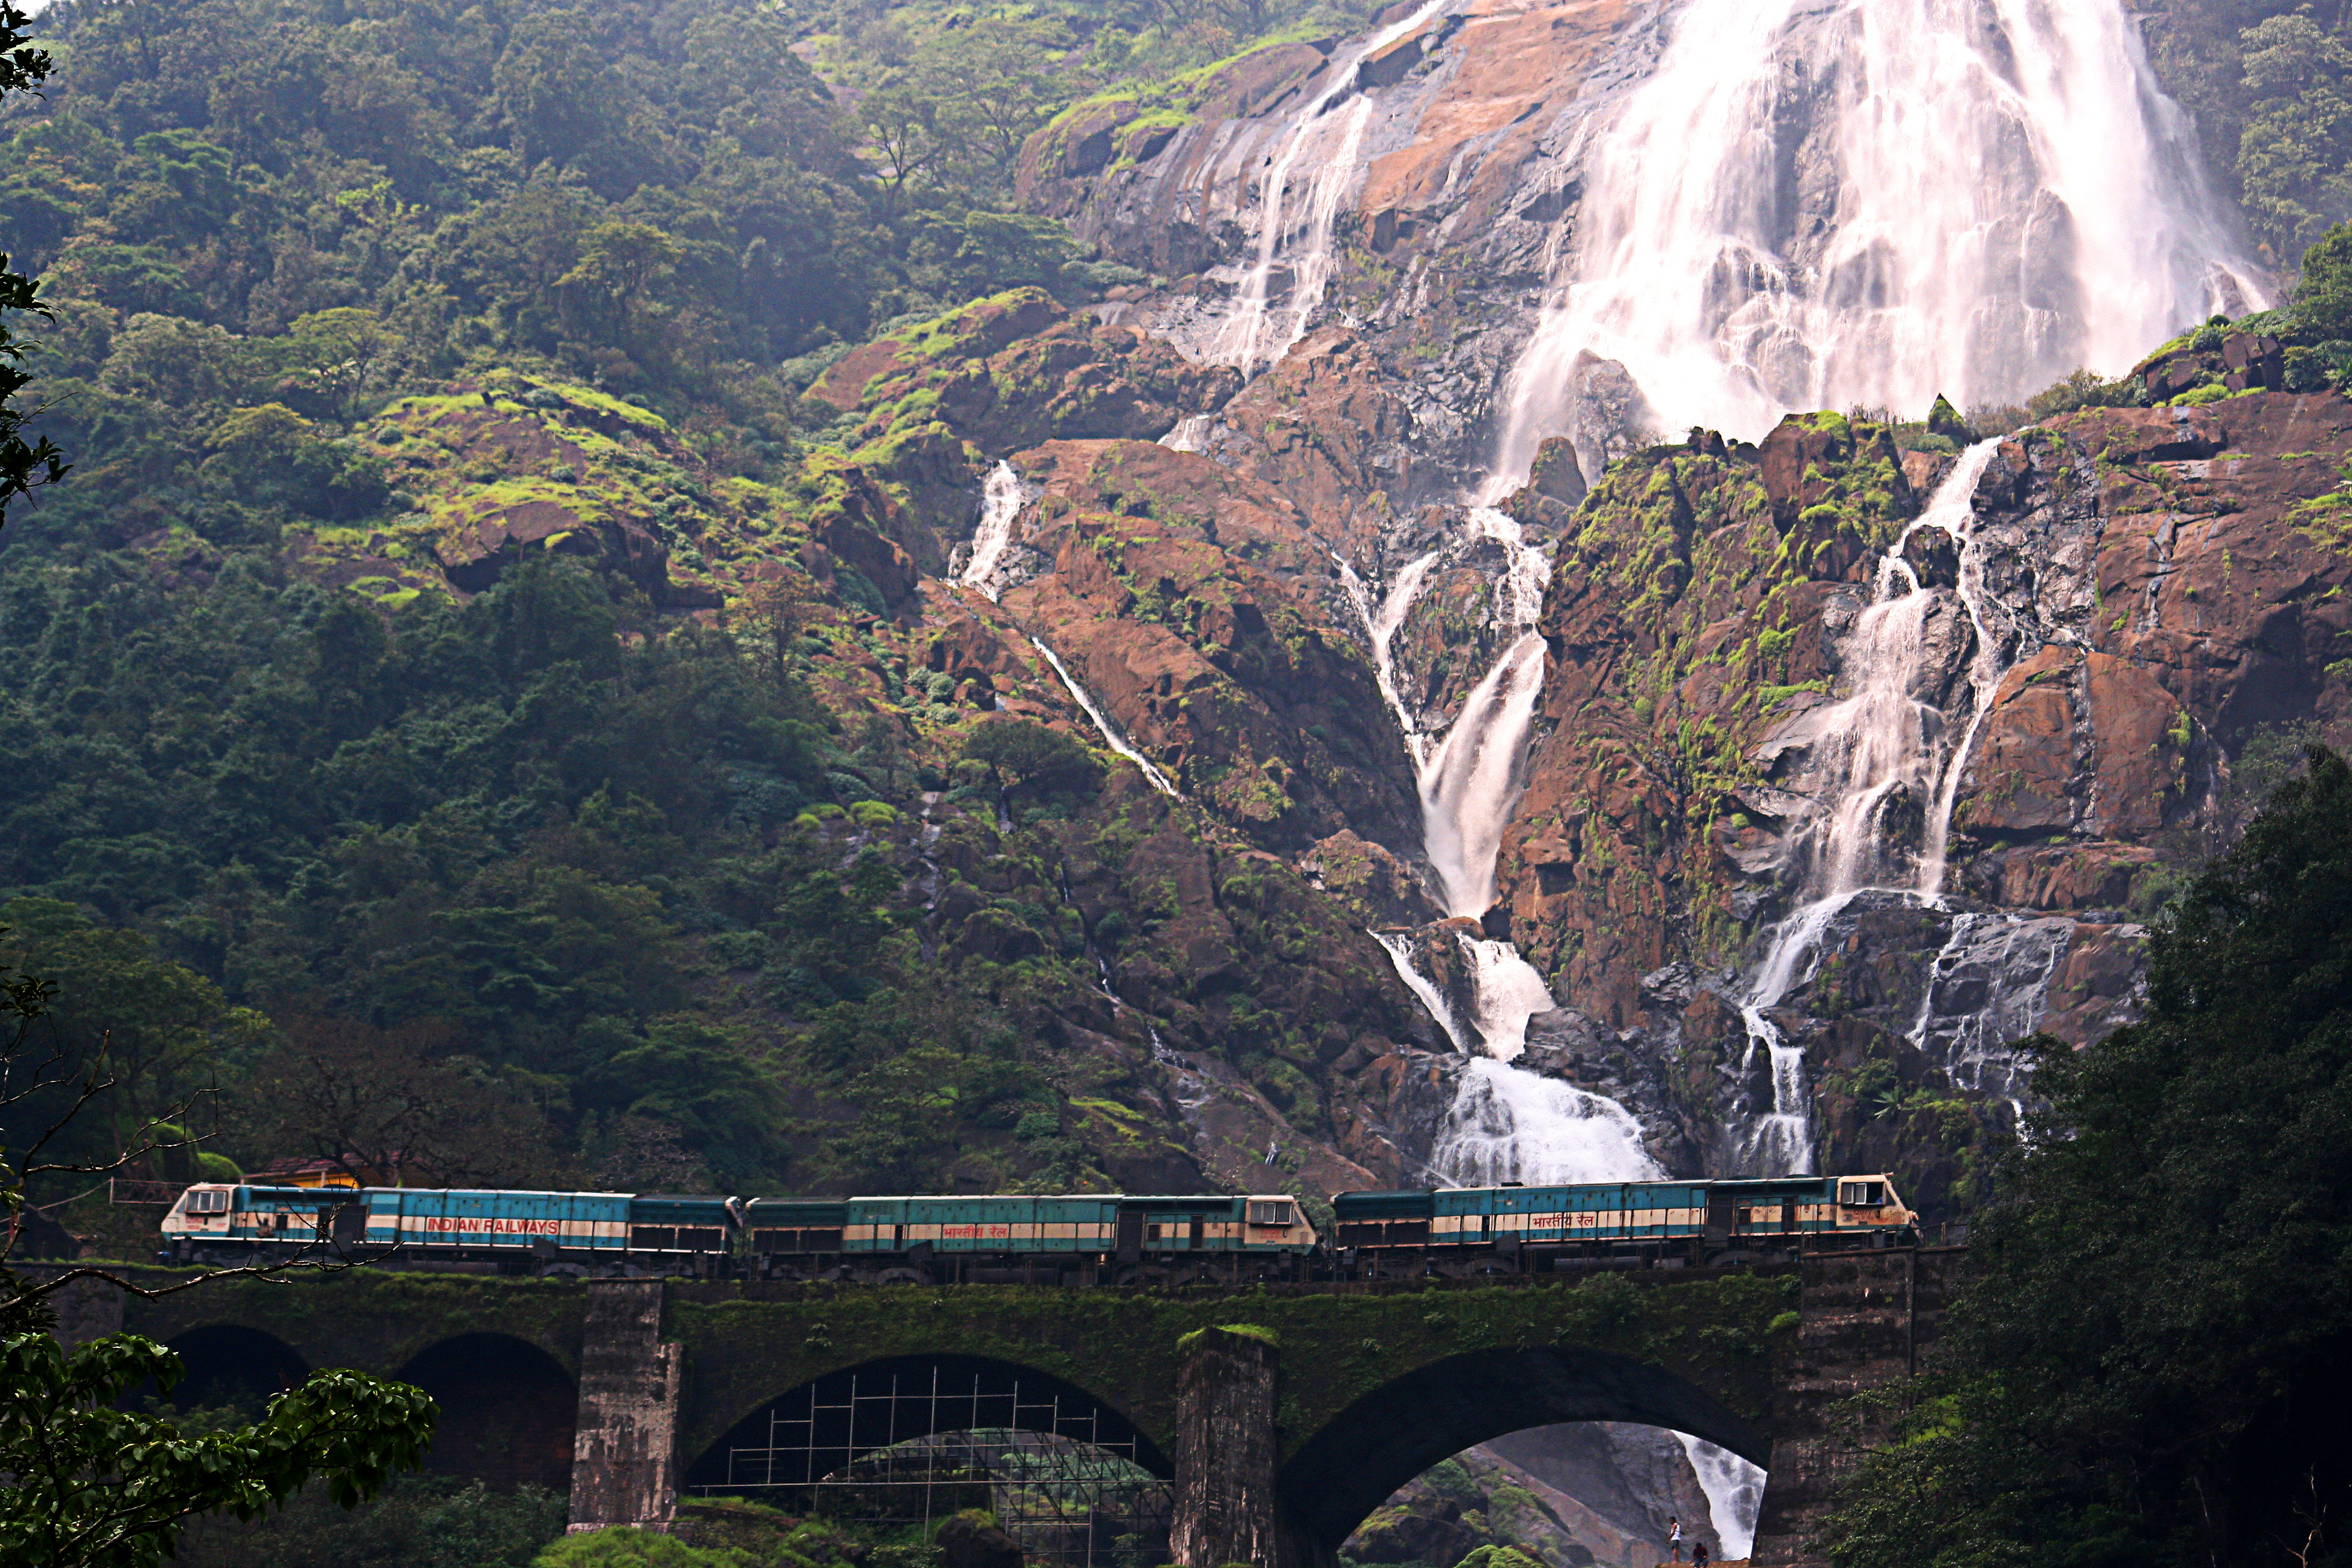 Konkan Railways at Dudhsagar Falls